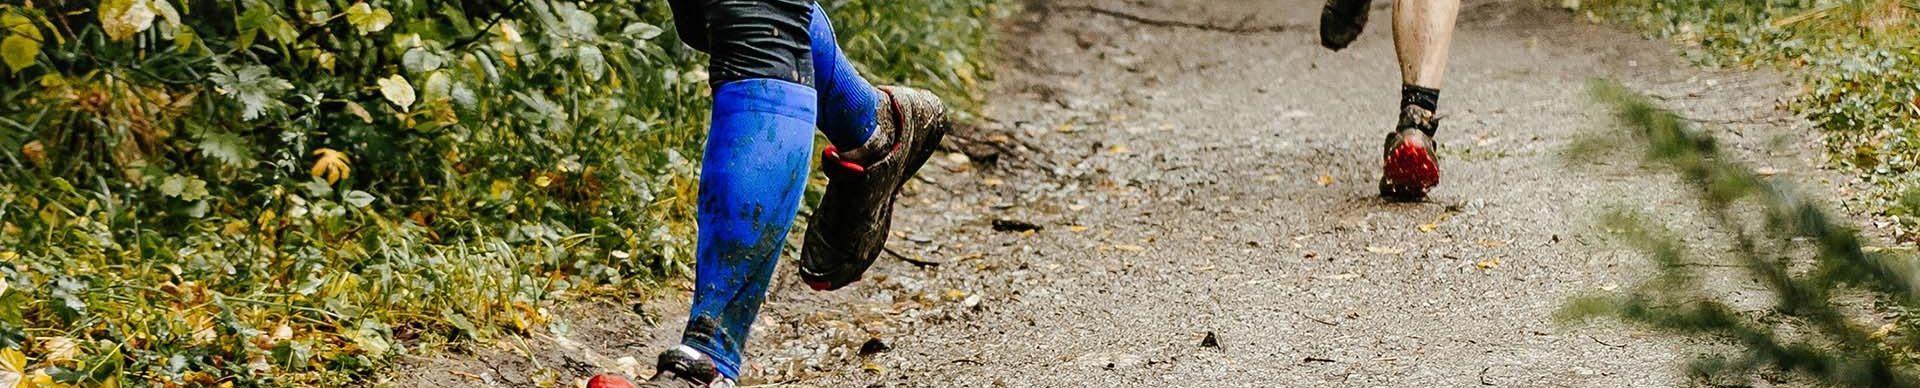 trail haut france e1560344761318